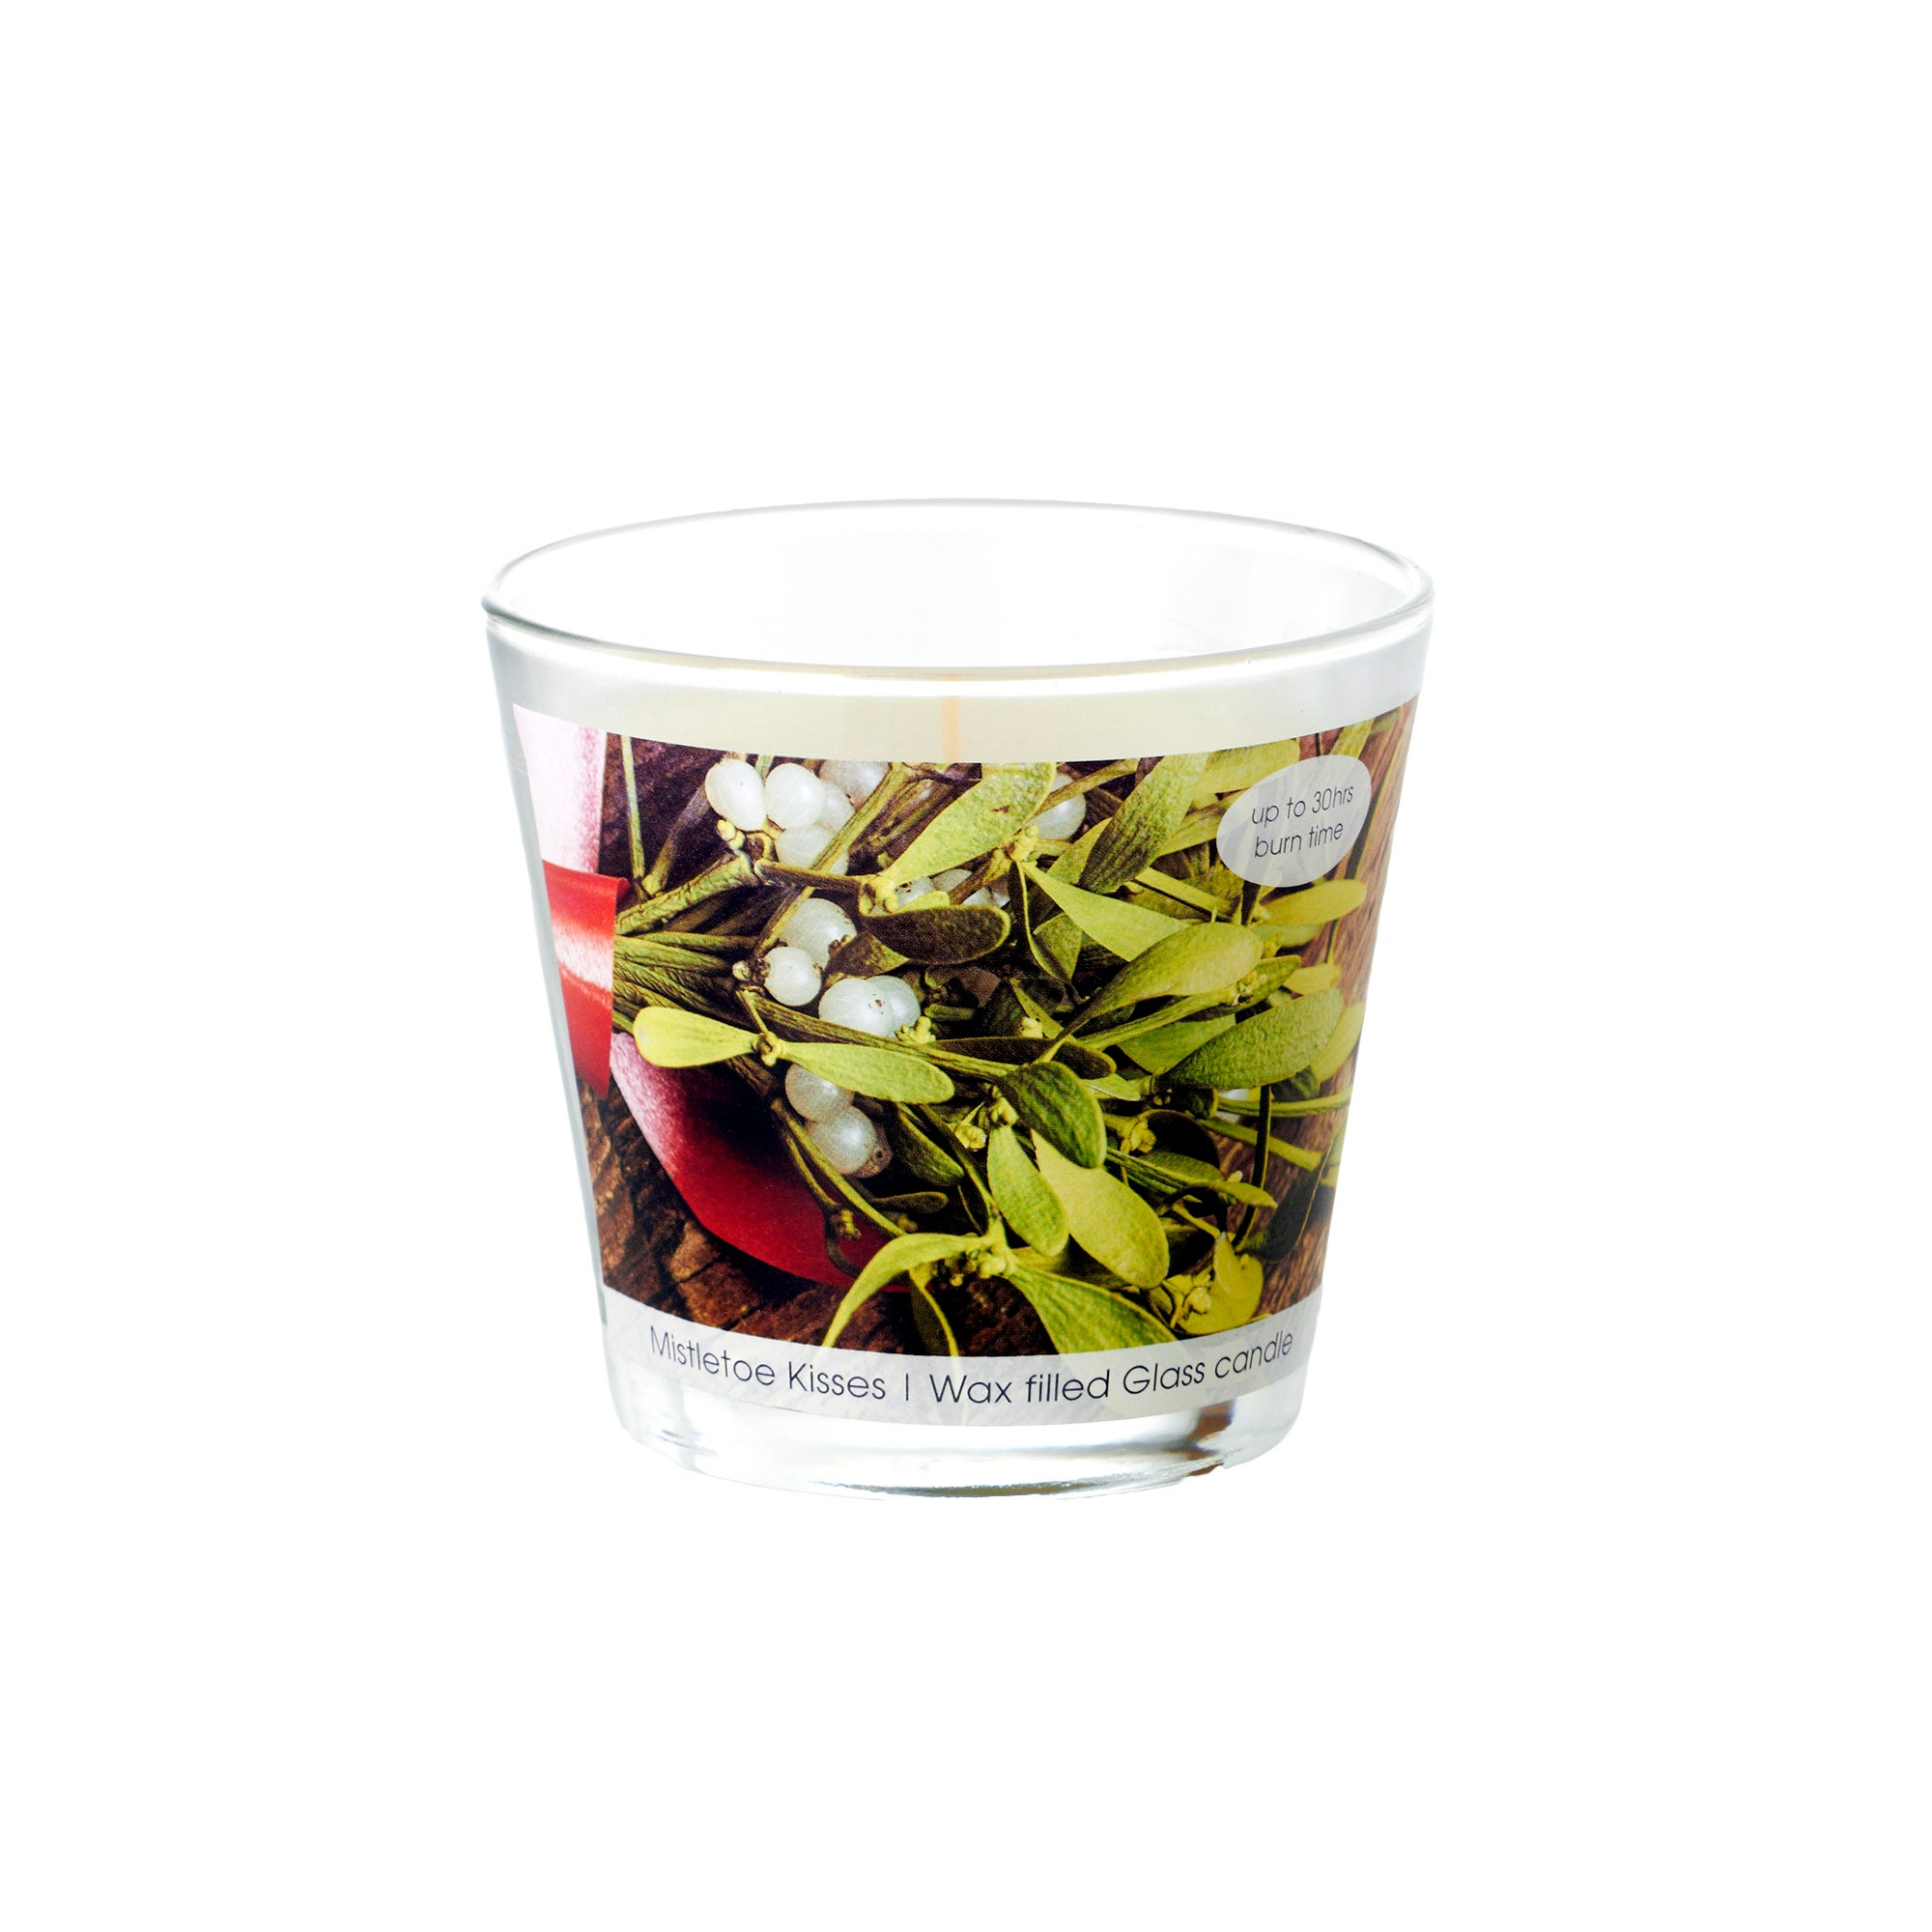 Mistletoe Kisses Wax Filled Glass Candle